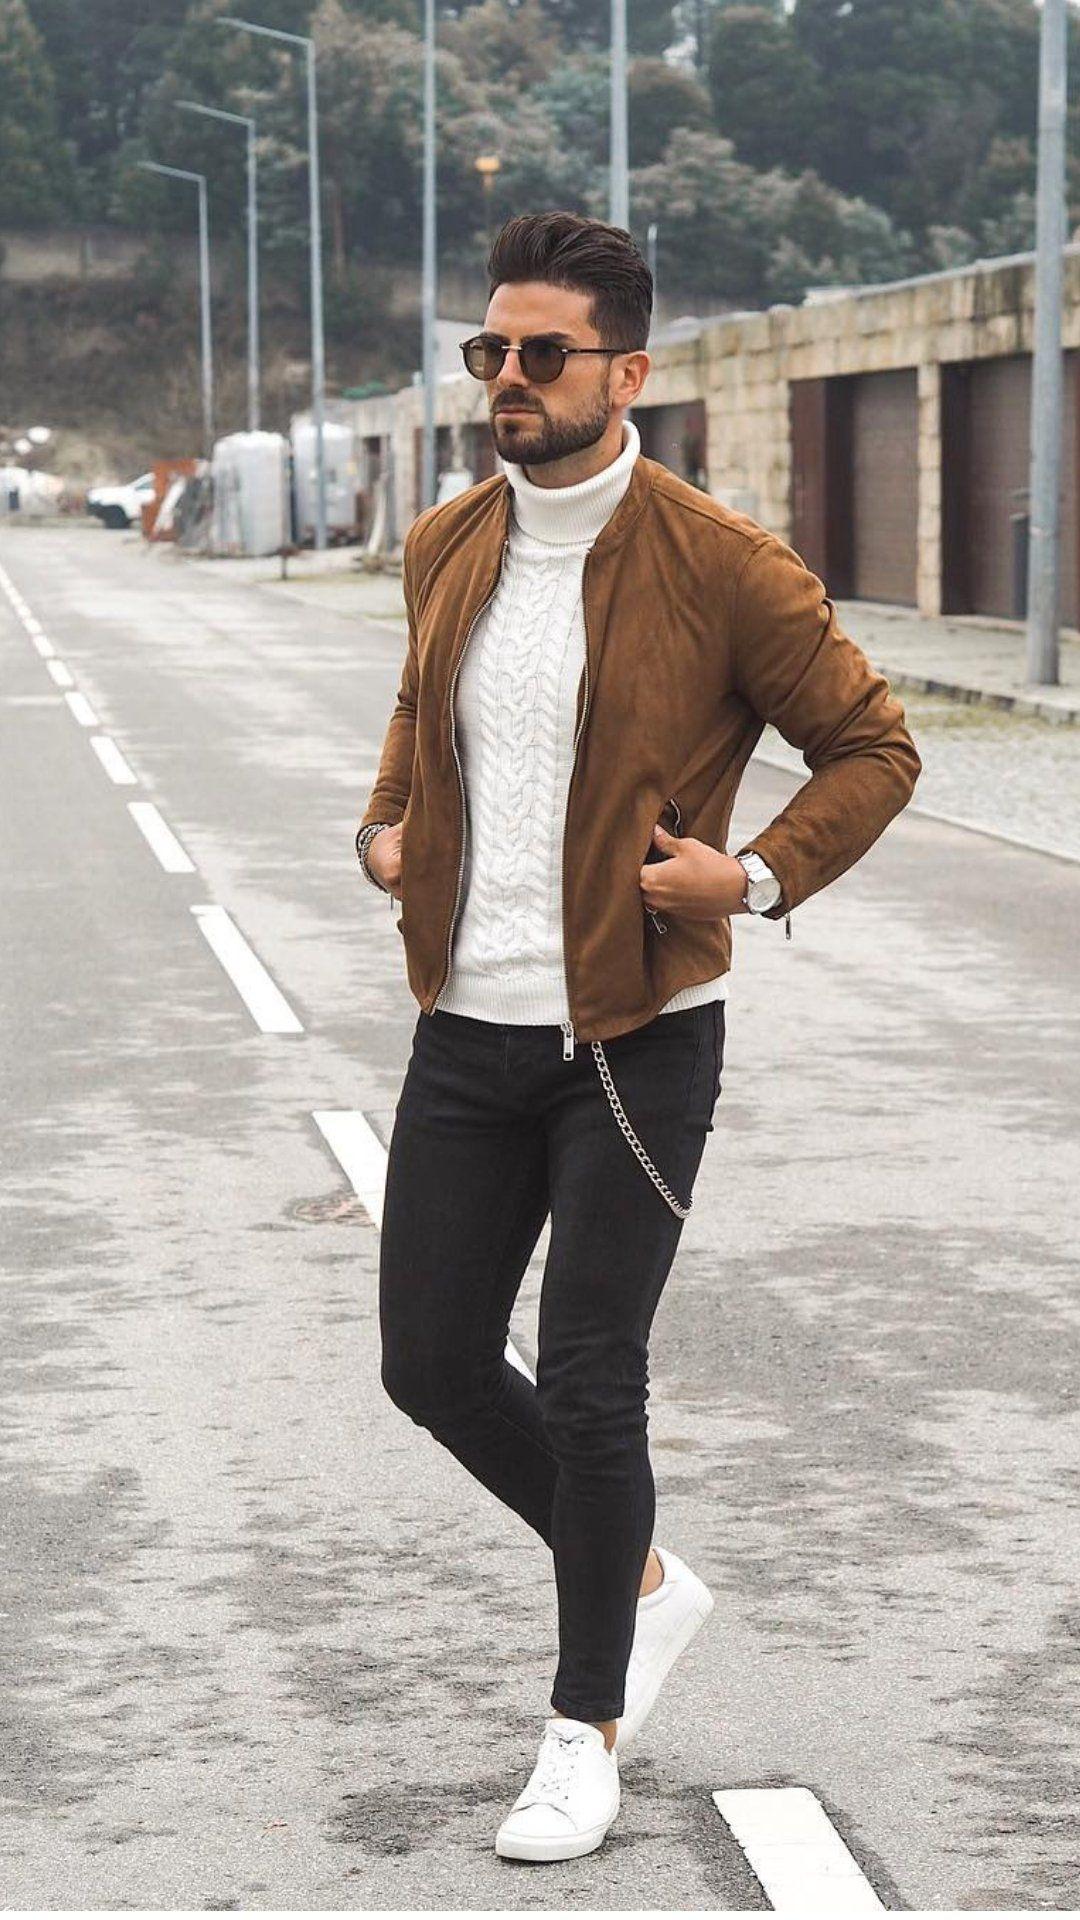 Coolest Bomber Jacket Outfits For Men Ootd Men Outfits Winter Outfits Men Brown Jacket Outfit Men